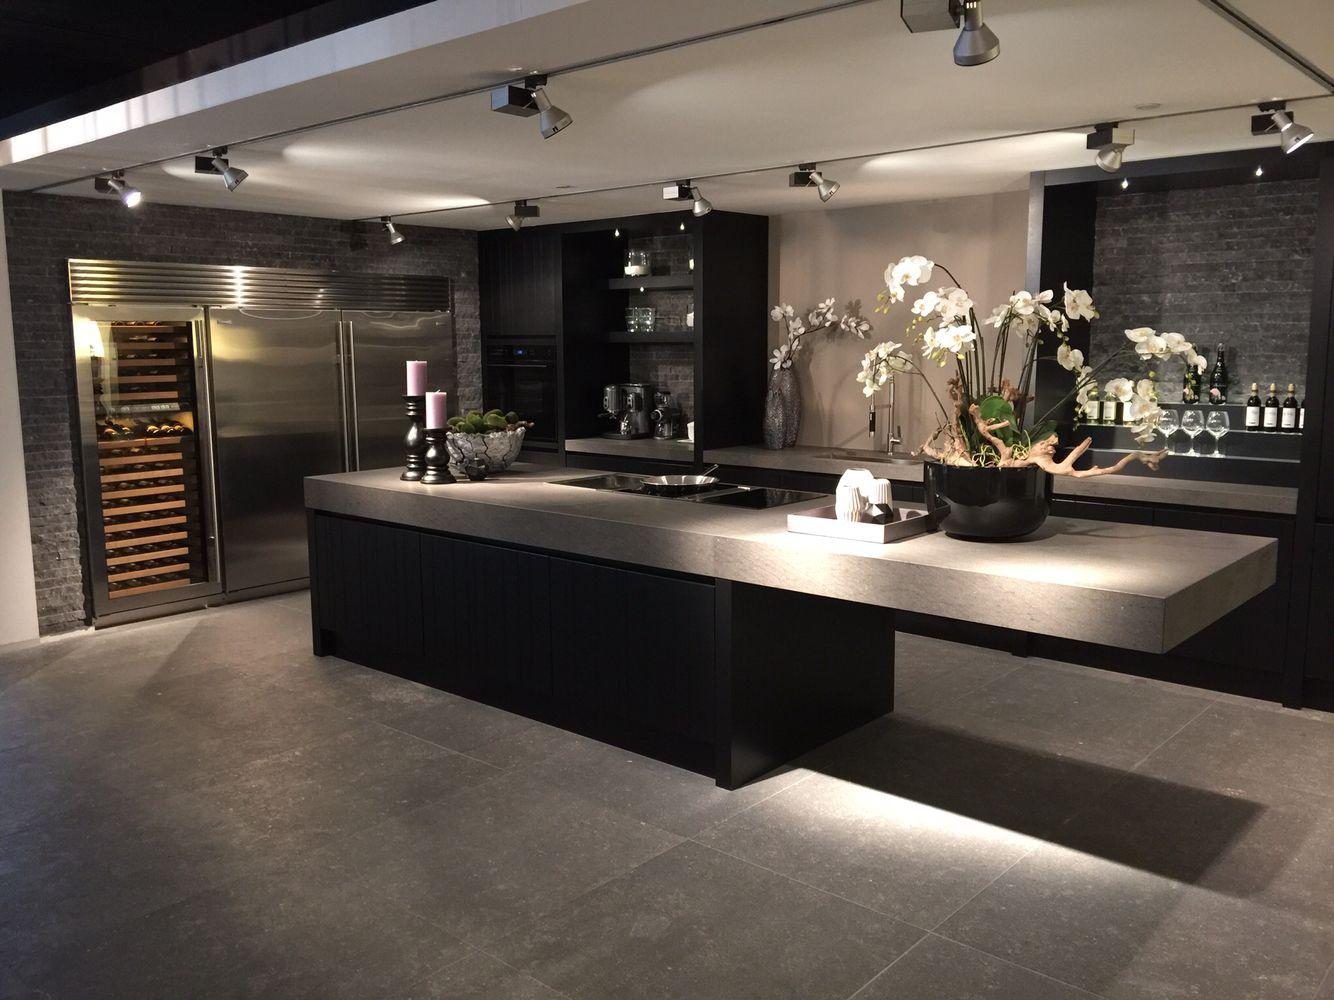 Mooie Eclectische Woonkeuken : Mooie barletti keuken kitchen by 佳蓉 沈 keuken